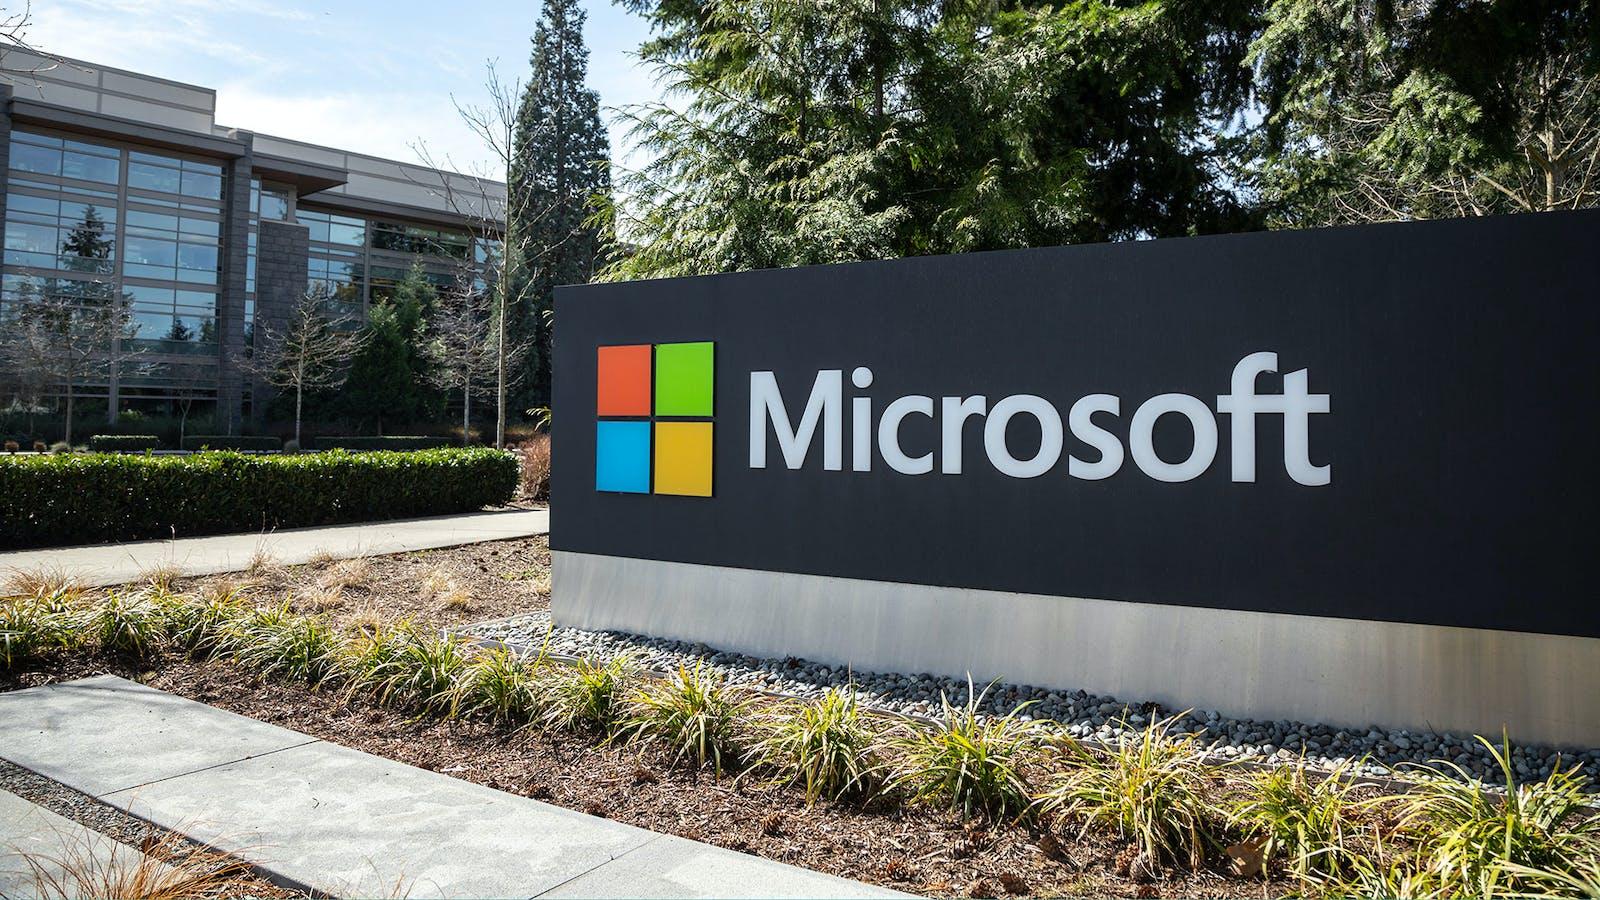 Microsoft headquarters in Redmond, Washington. Photo by Shutterstock.